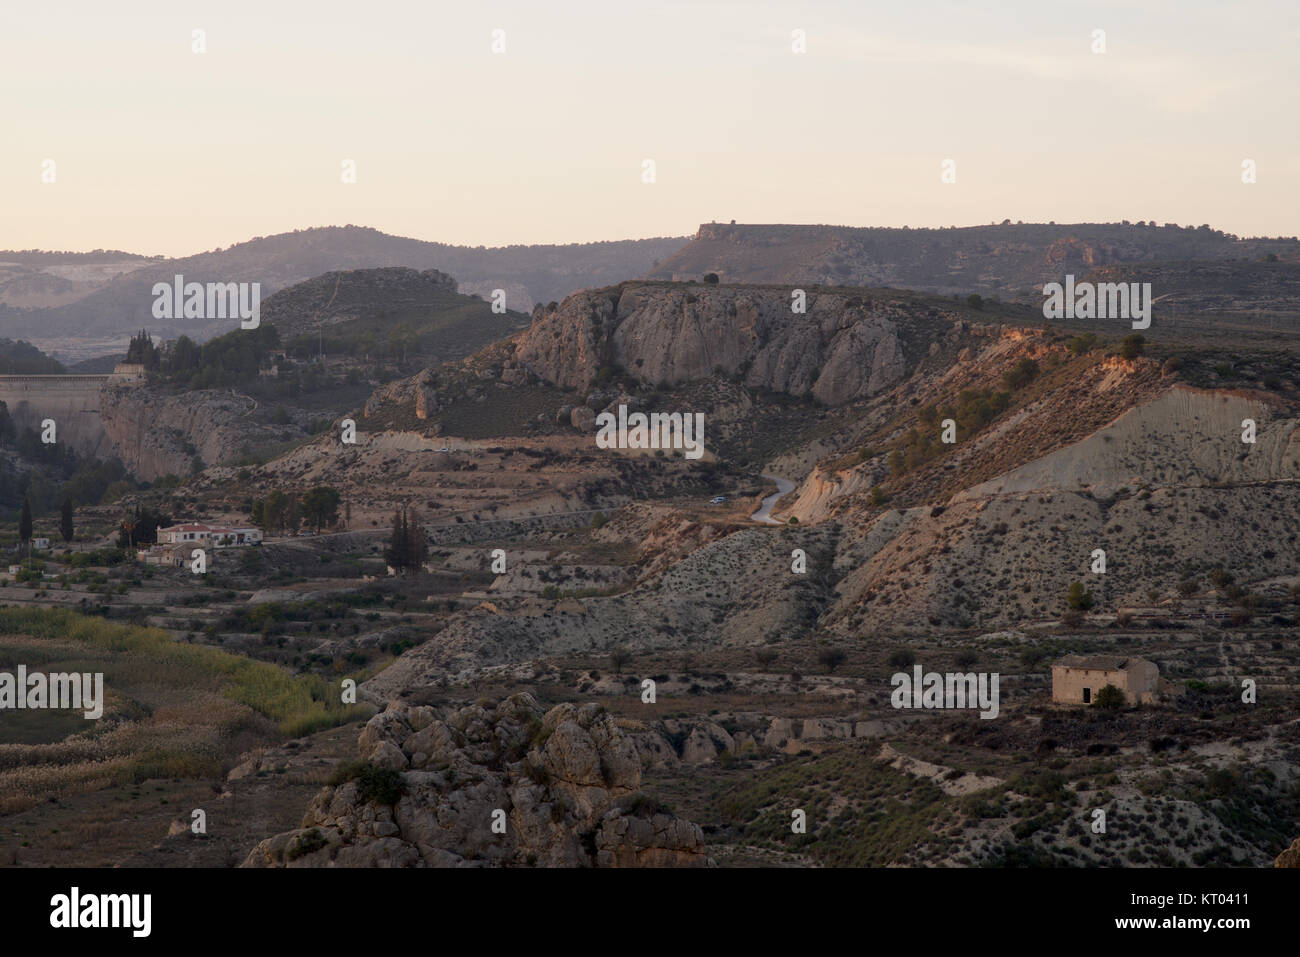 Landscape - rugged terrain at sunset - Stock Image